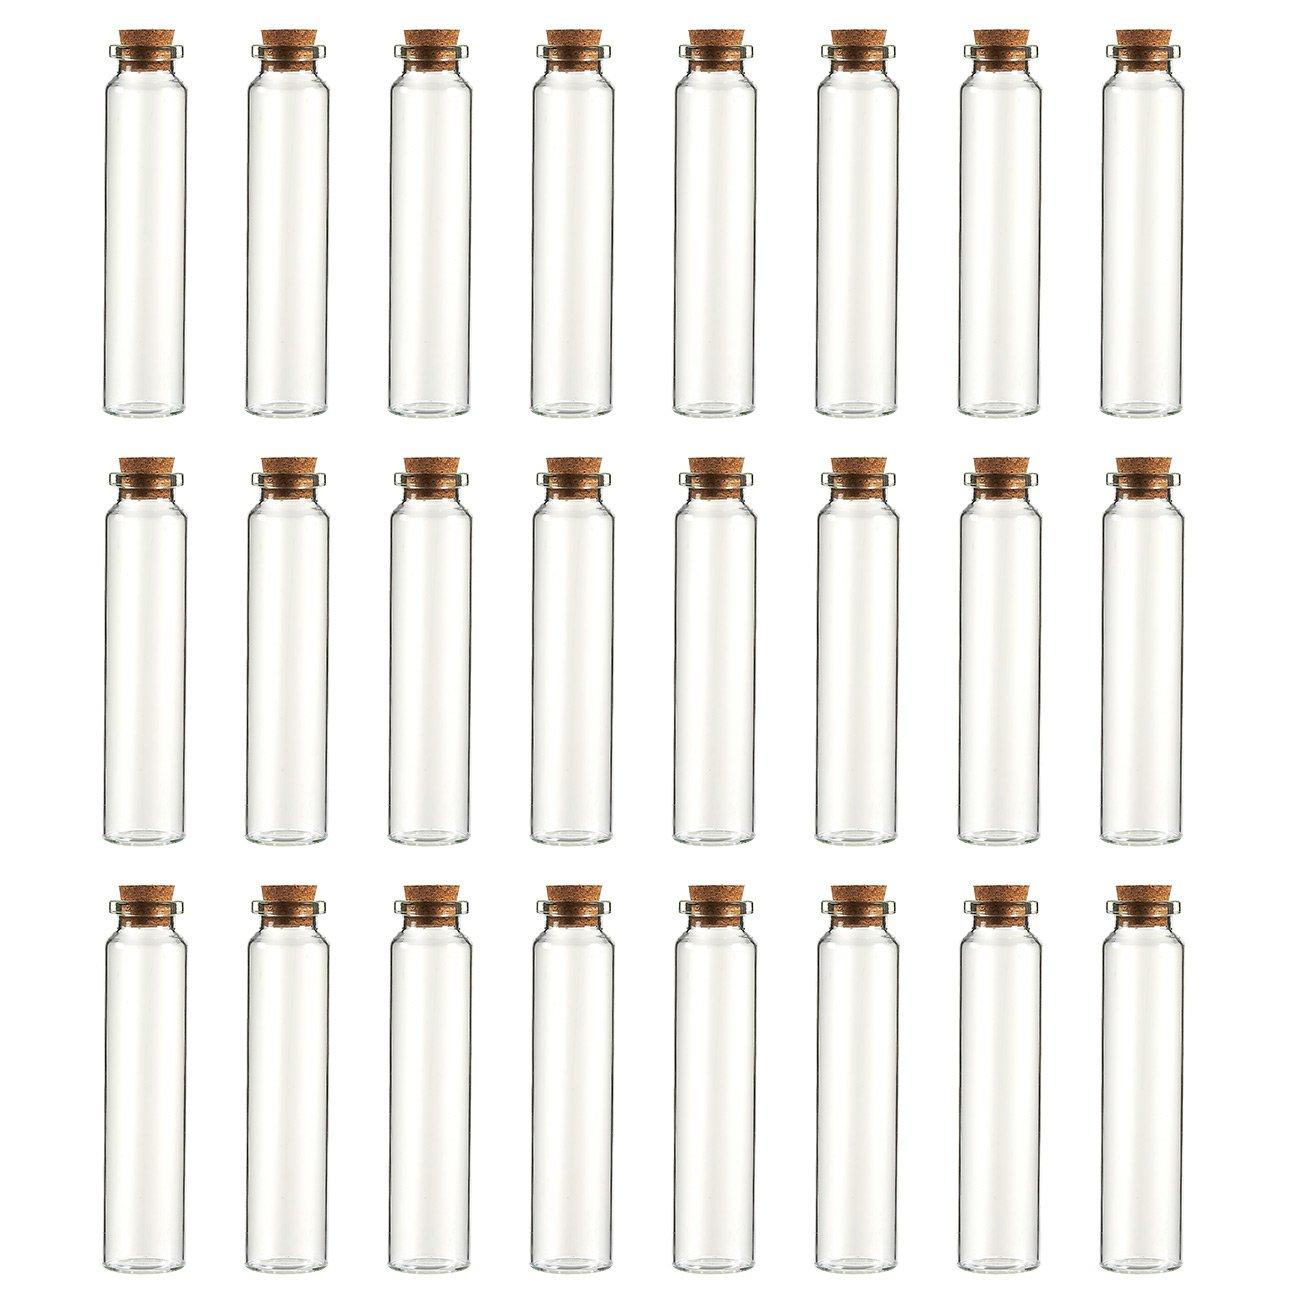 Clear Glass Bottles with Cork Lids- 24-Pack Mini Transparent Jars